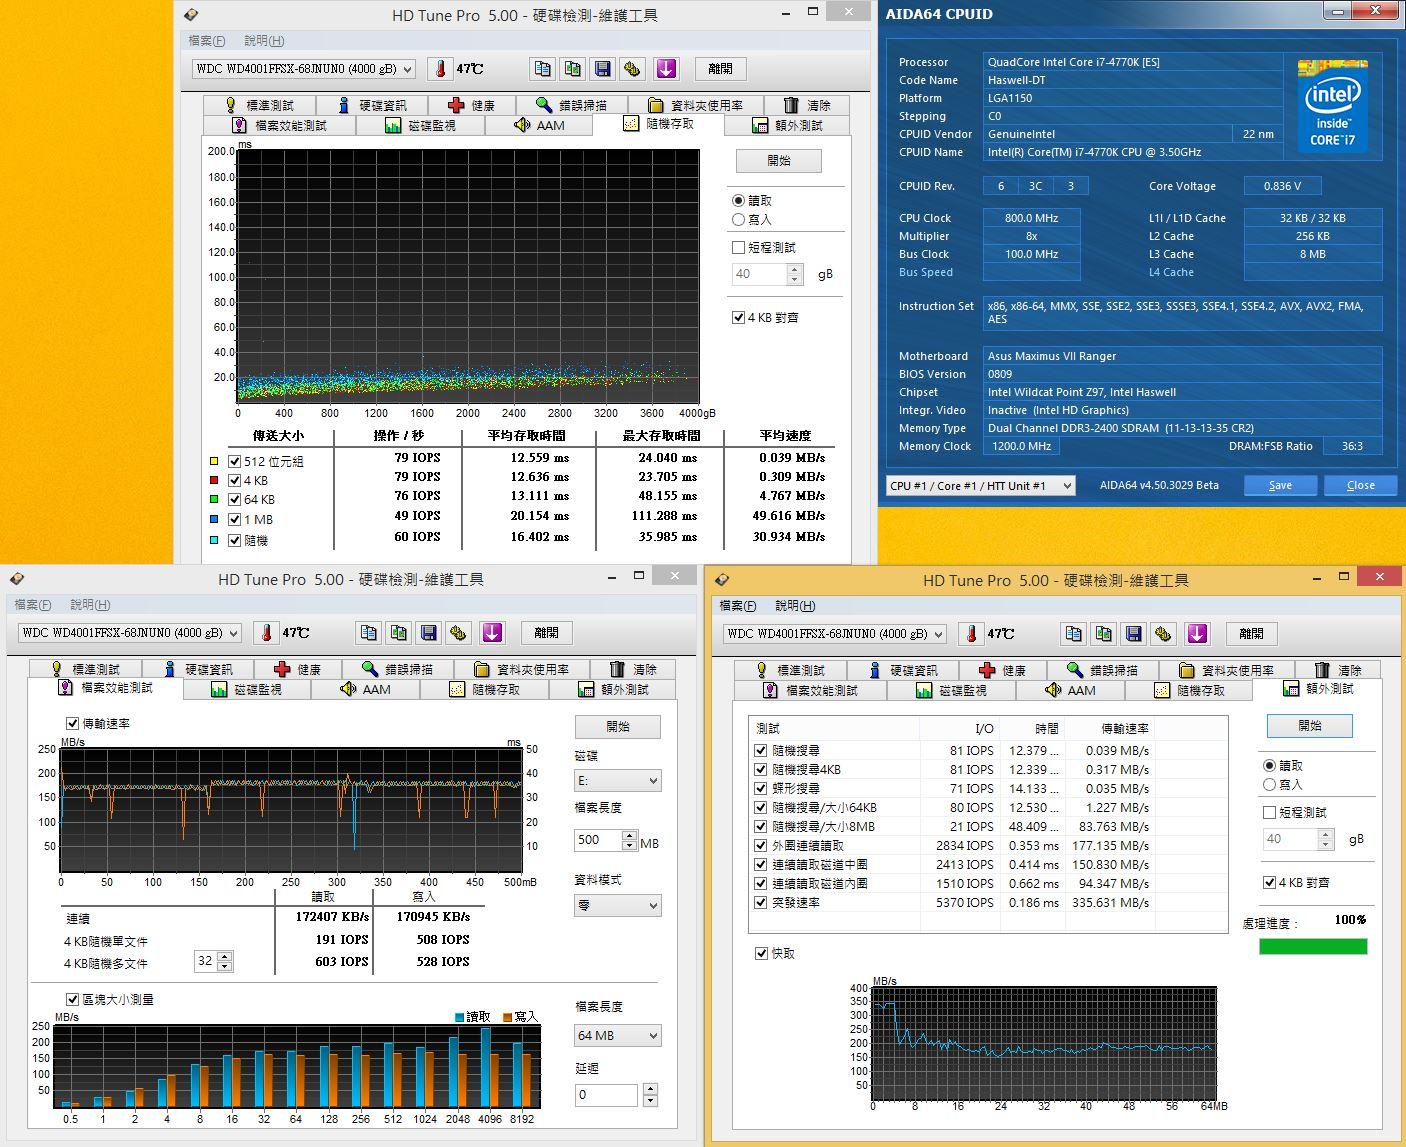 [XF] 轉速提升效能躍進 更有貼心5年保固WD RED Pro 4TB硬碟及Synology DS1813+ NAS應用實測